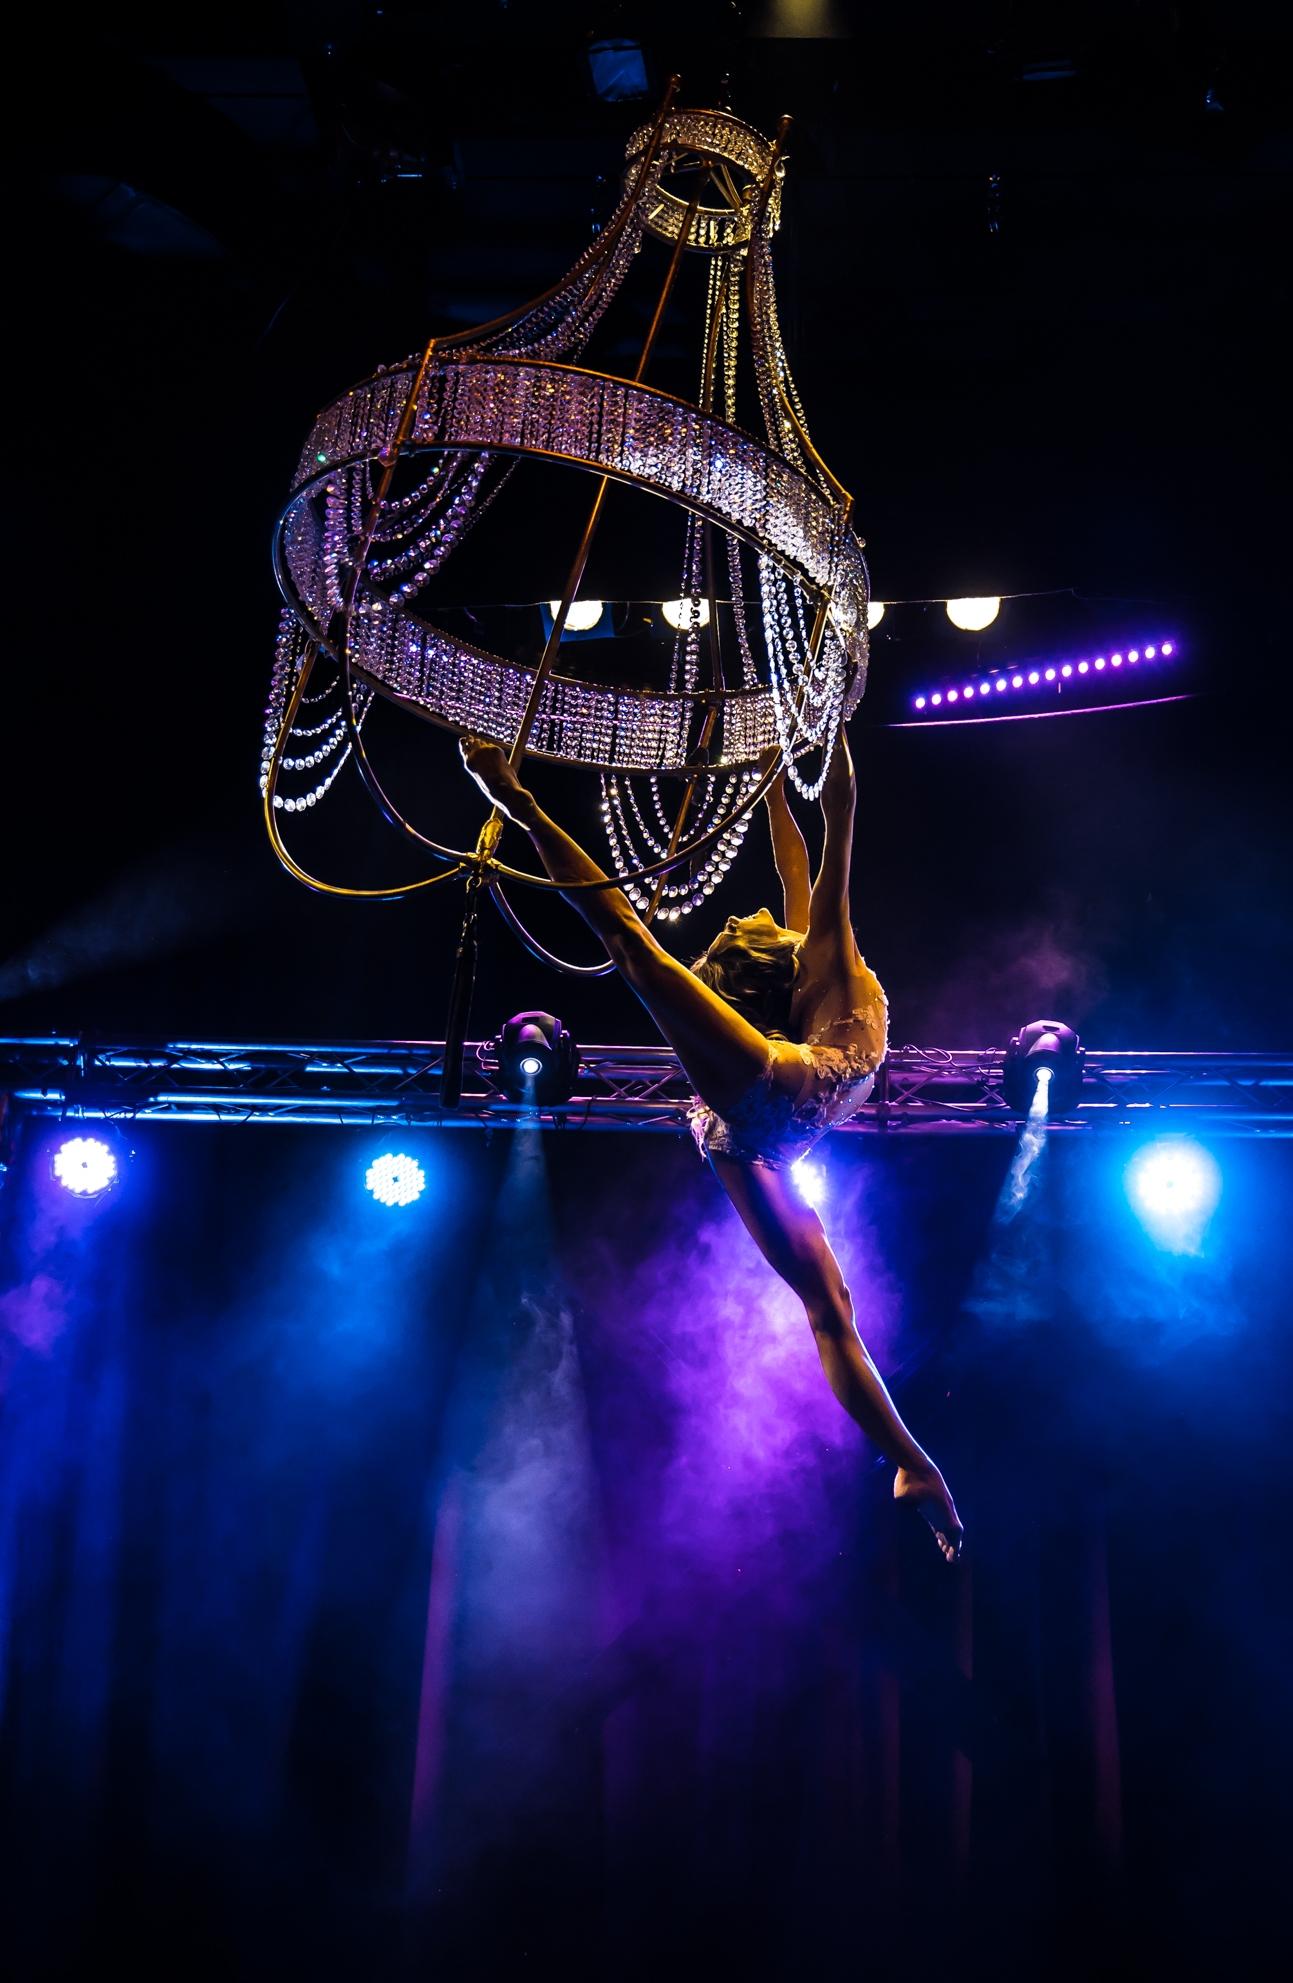 Supertalent luftartistin Air Candy - Flying Chandelier Showact - Aerial Chandelier  - Luftakrobatik Kronleuchter